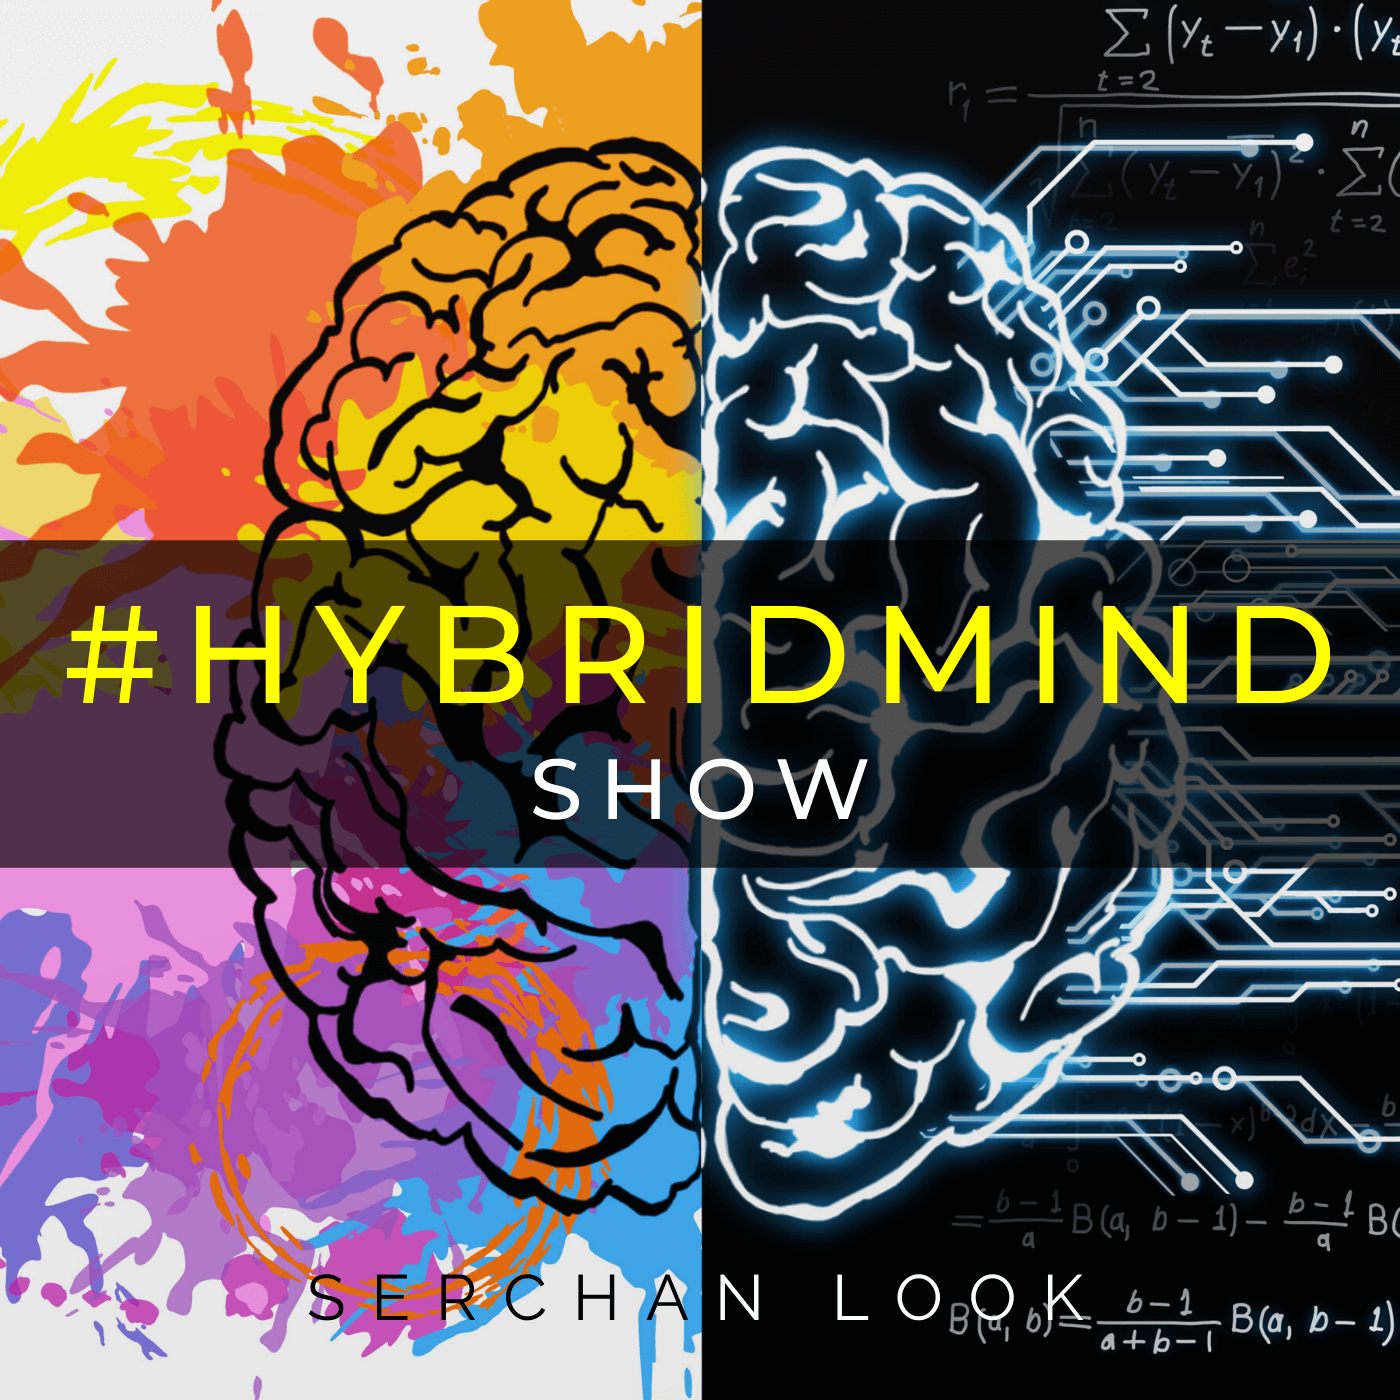 #0 Trailer - Hybrid Mind Show